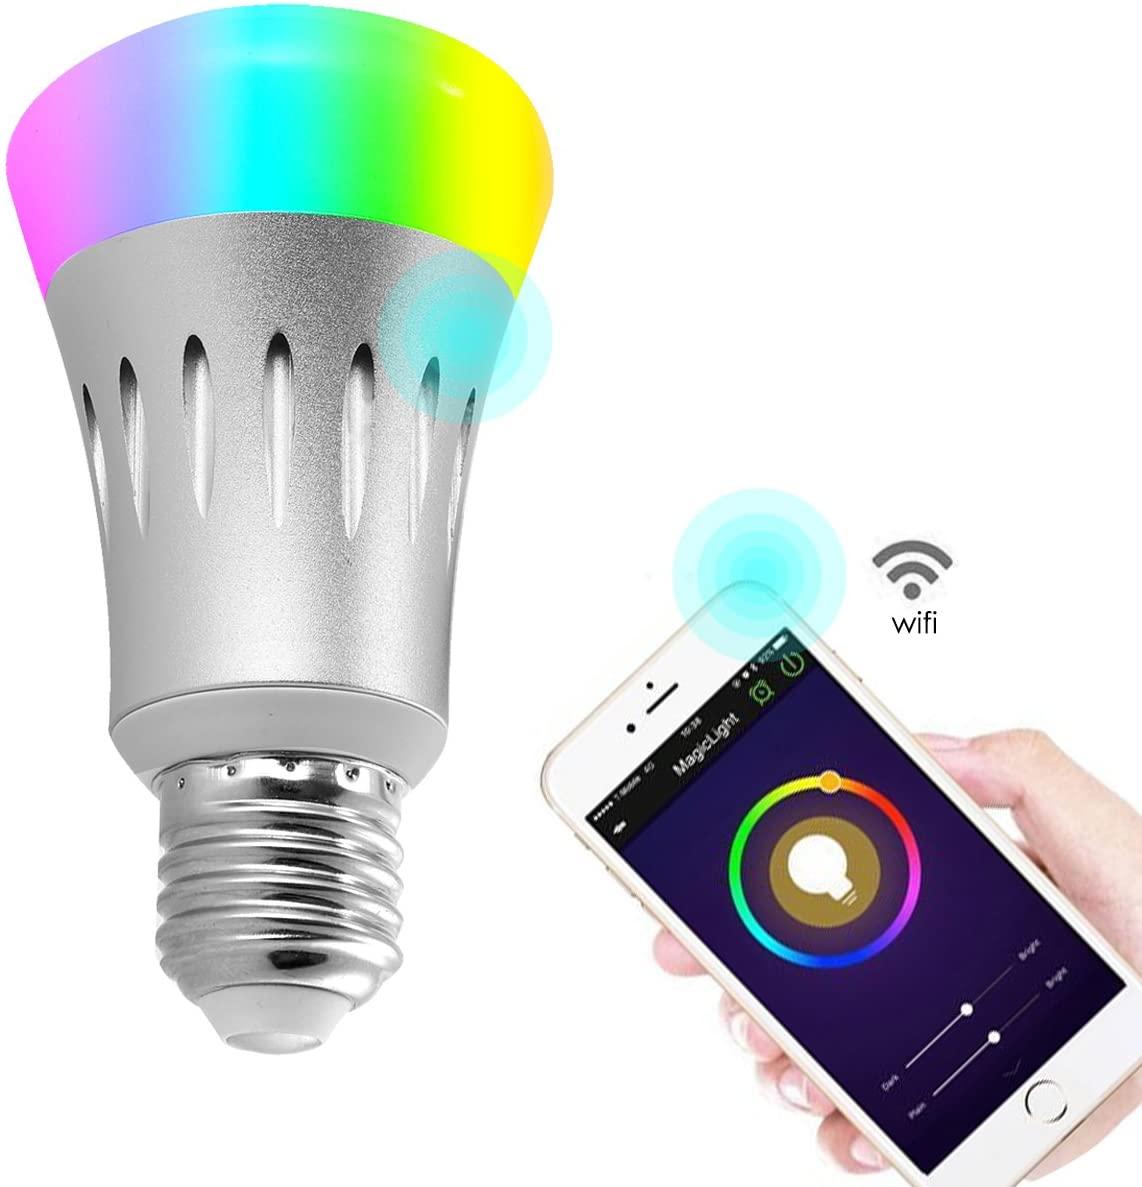 Wifi Led light bulbs,Wallfire 7W E27 Wireless WiFi Remote Control Smart Bulb Lamp Light For Echo Alexa